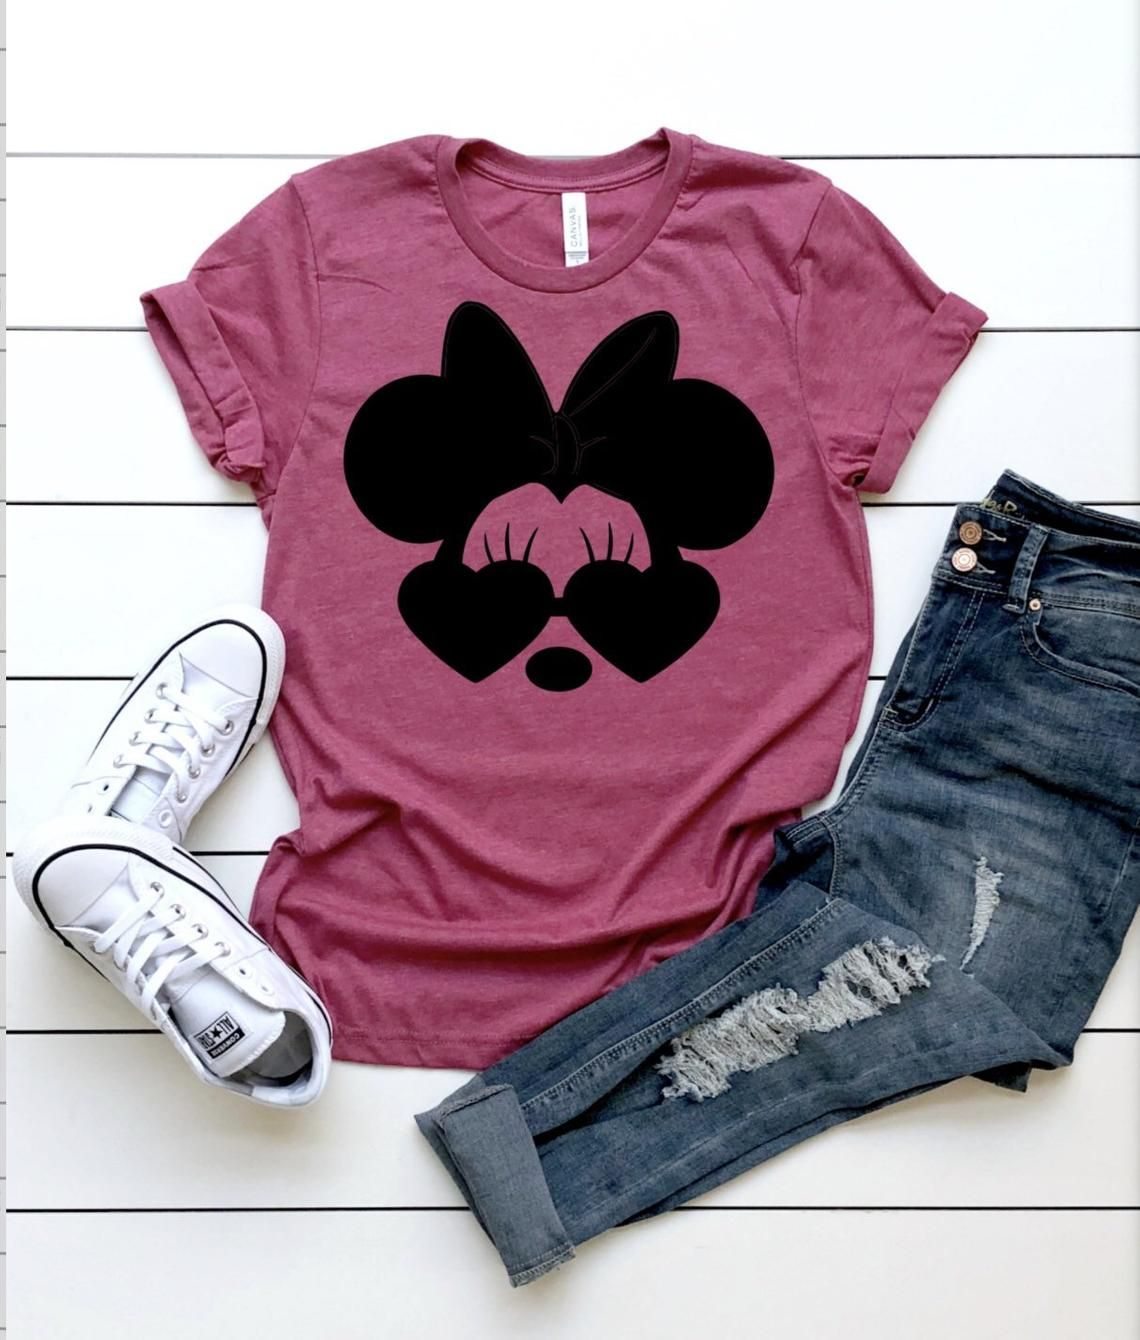 Minnie Mouse Sunglasses Shirt, Disney Shirts, Womens Disney Shirt, Disney Shirt, Kids Disney Shirts, Matching Disney Shirts, Minnie Mouse